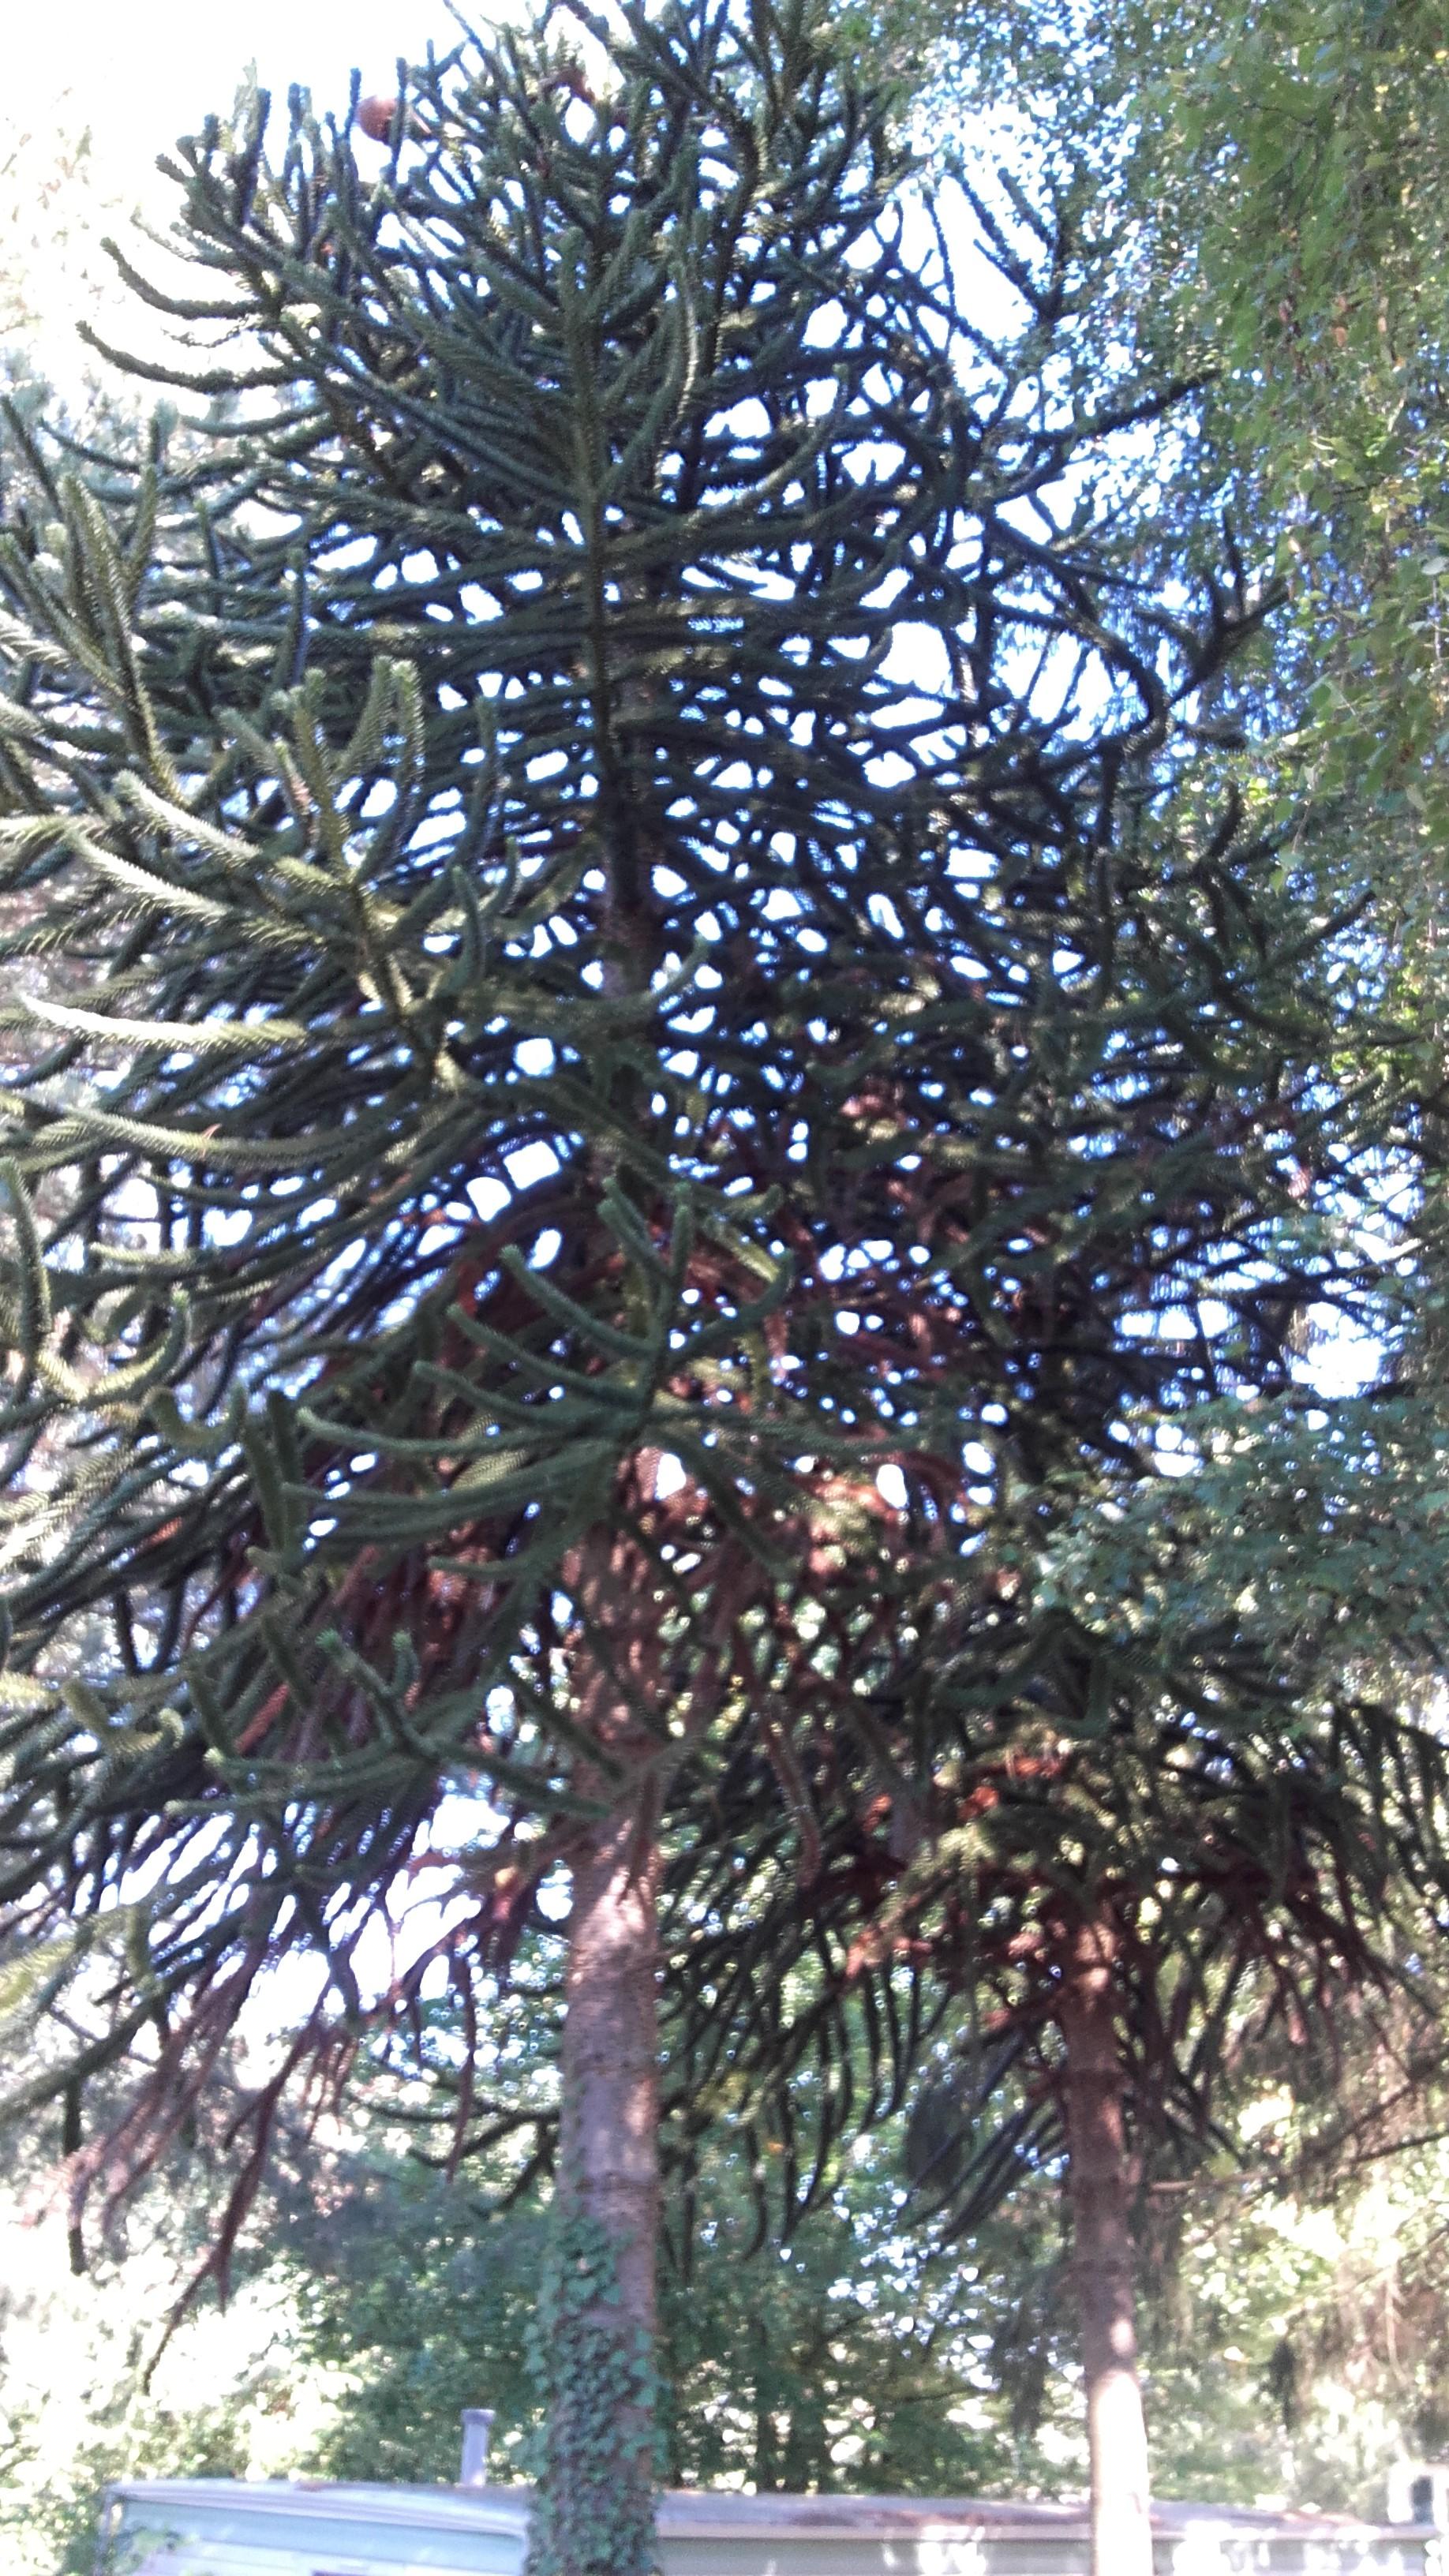 Un Araucarias ou pin du Chili